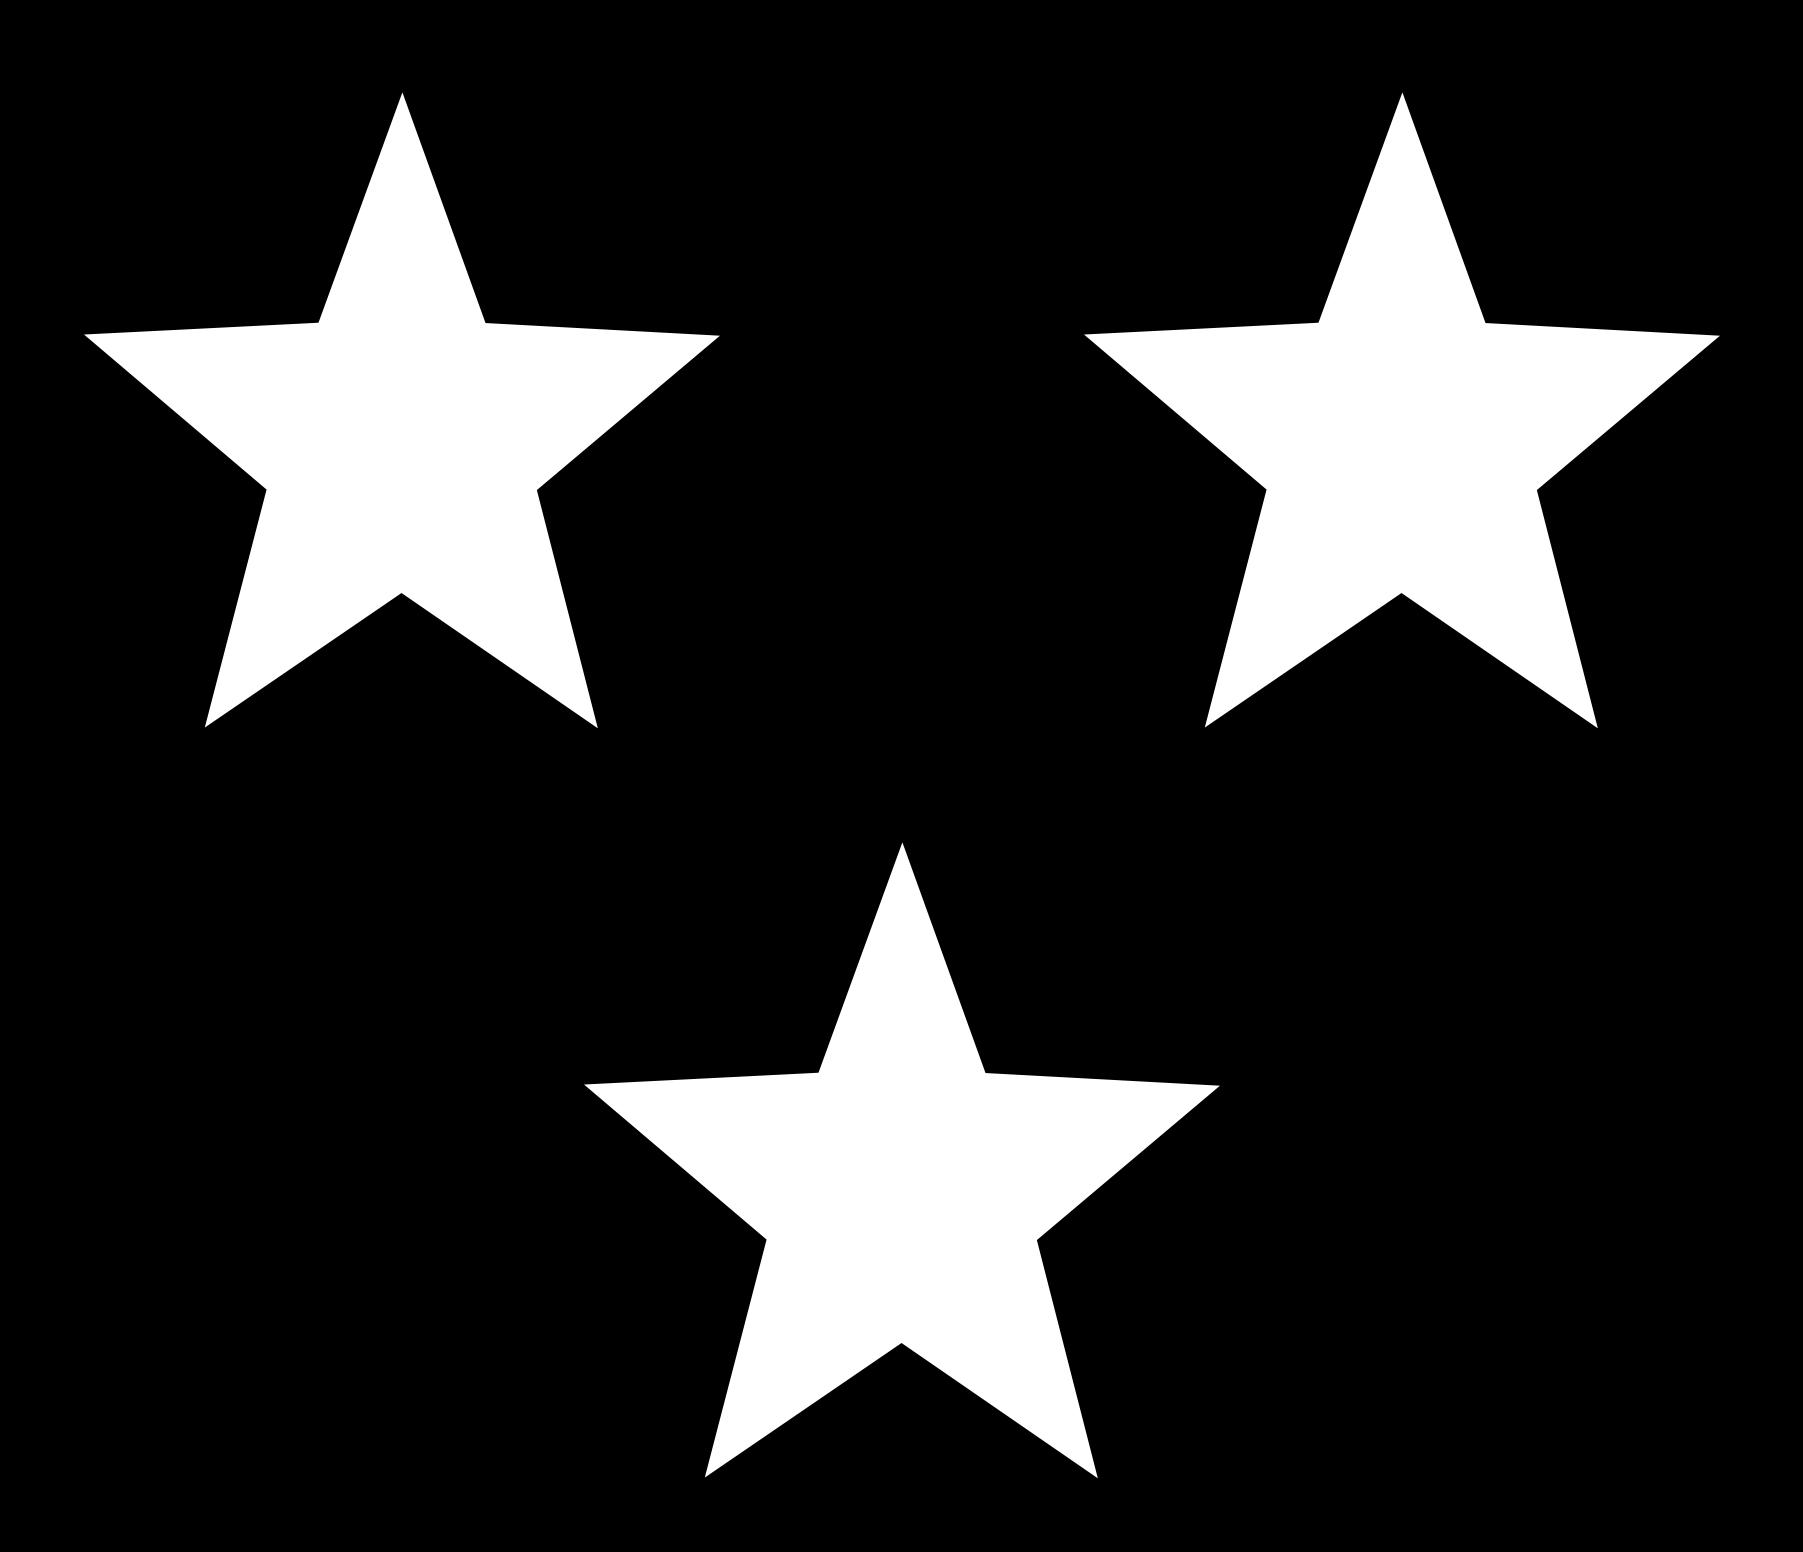 Black and white star money clipart